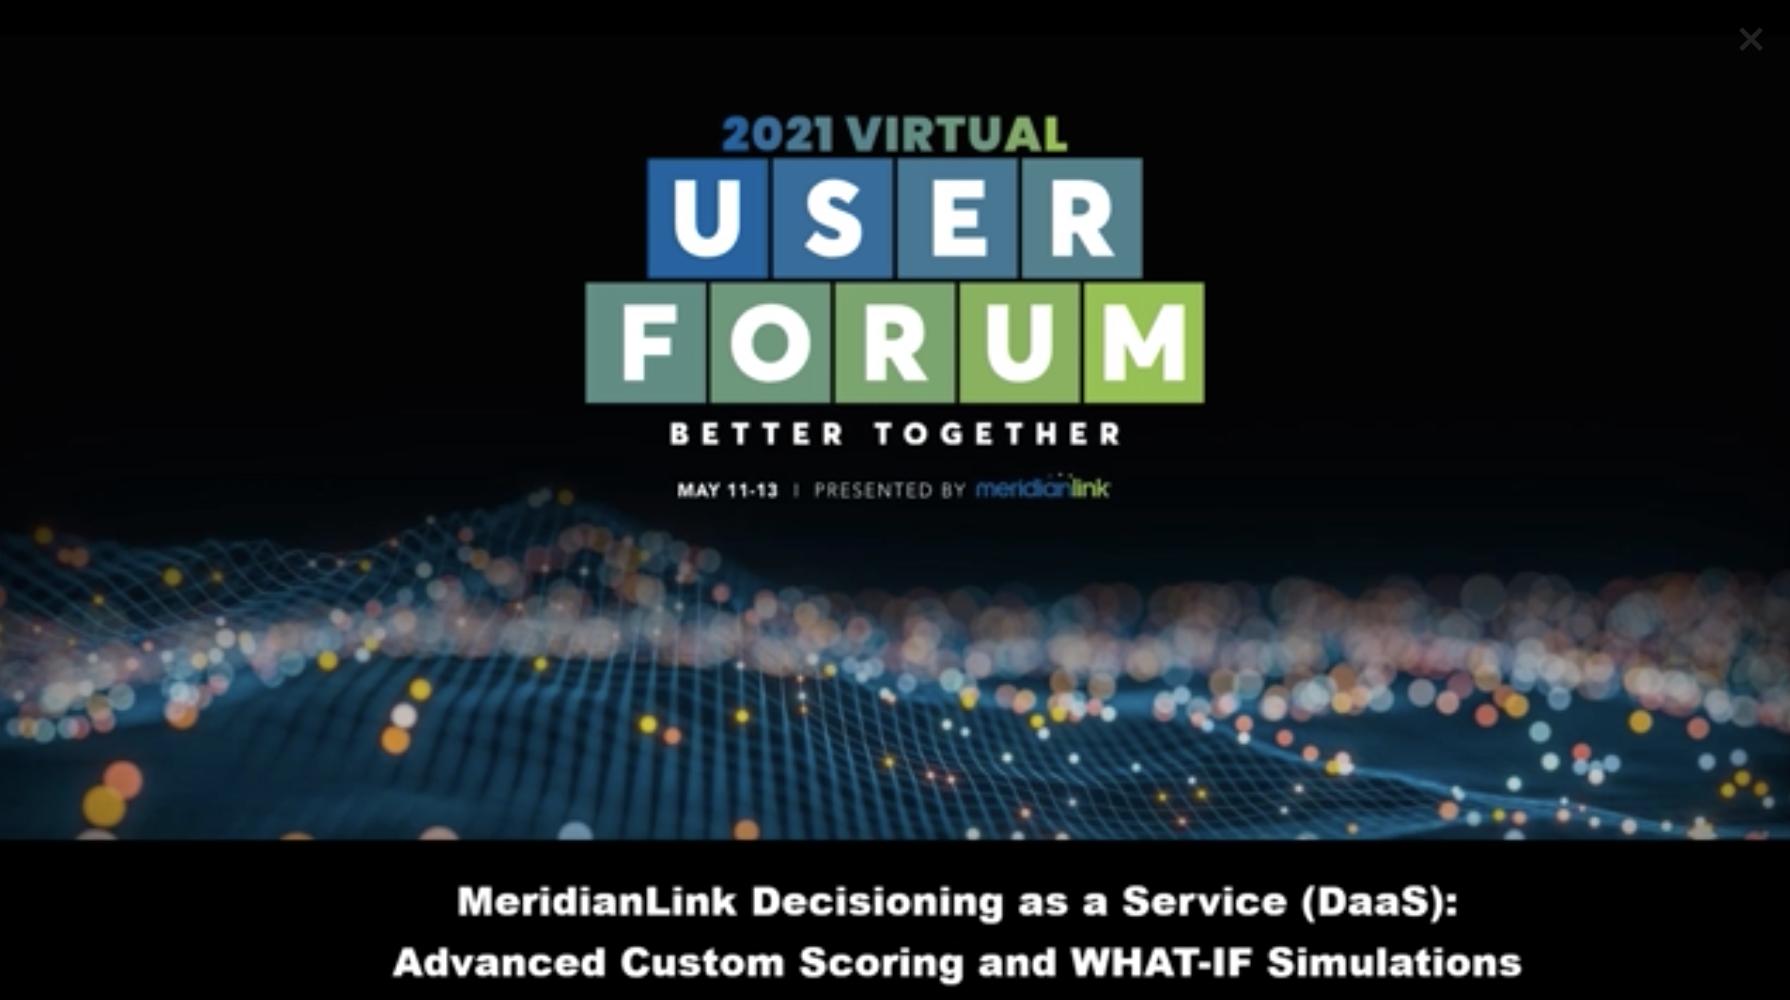 MeridianLink Decisioning as a Service (Daas)